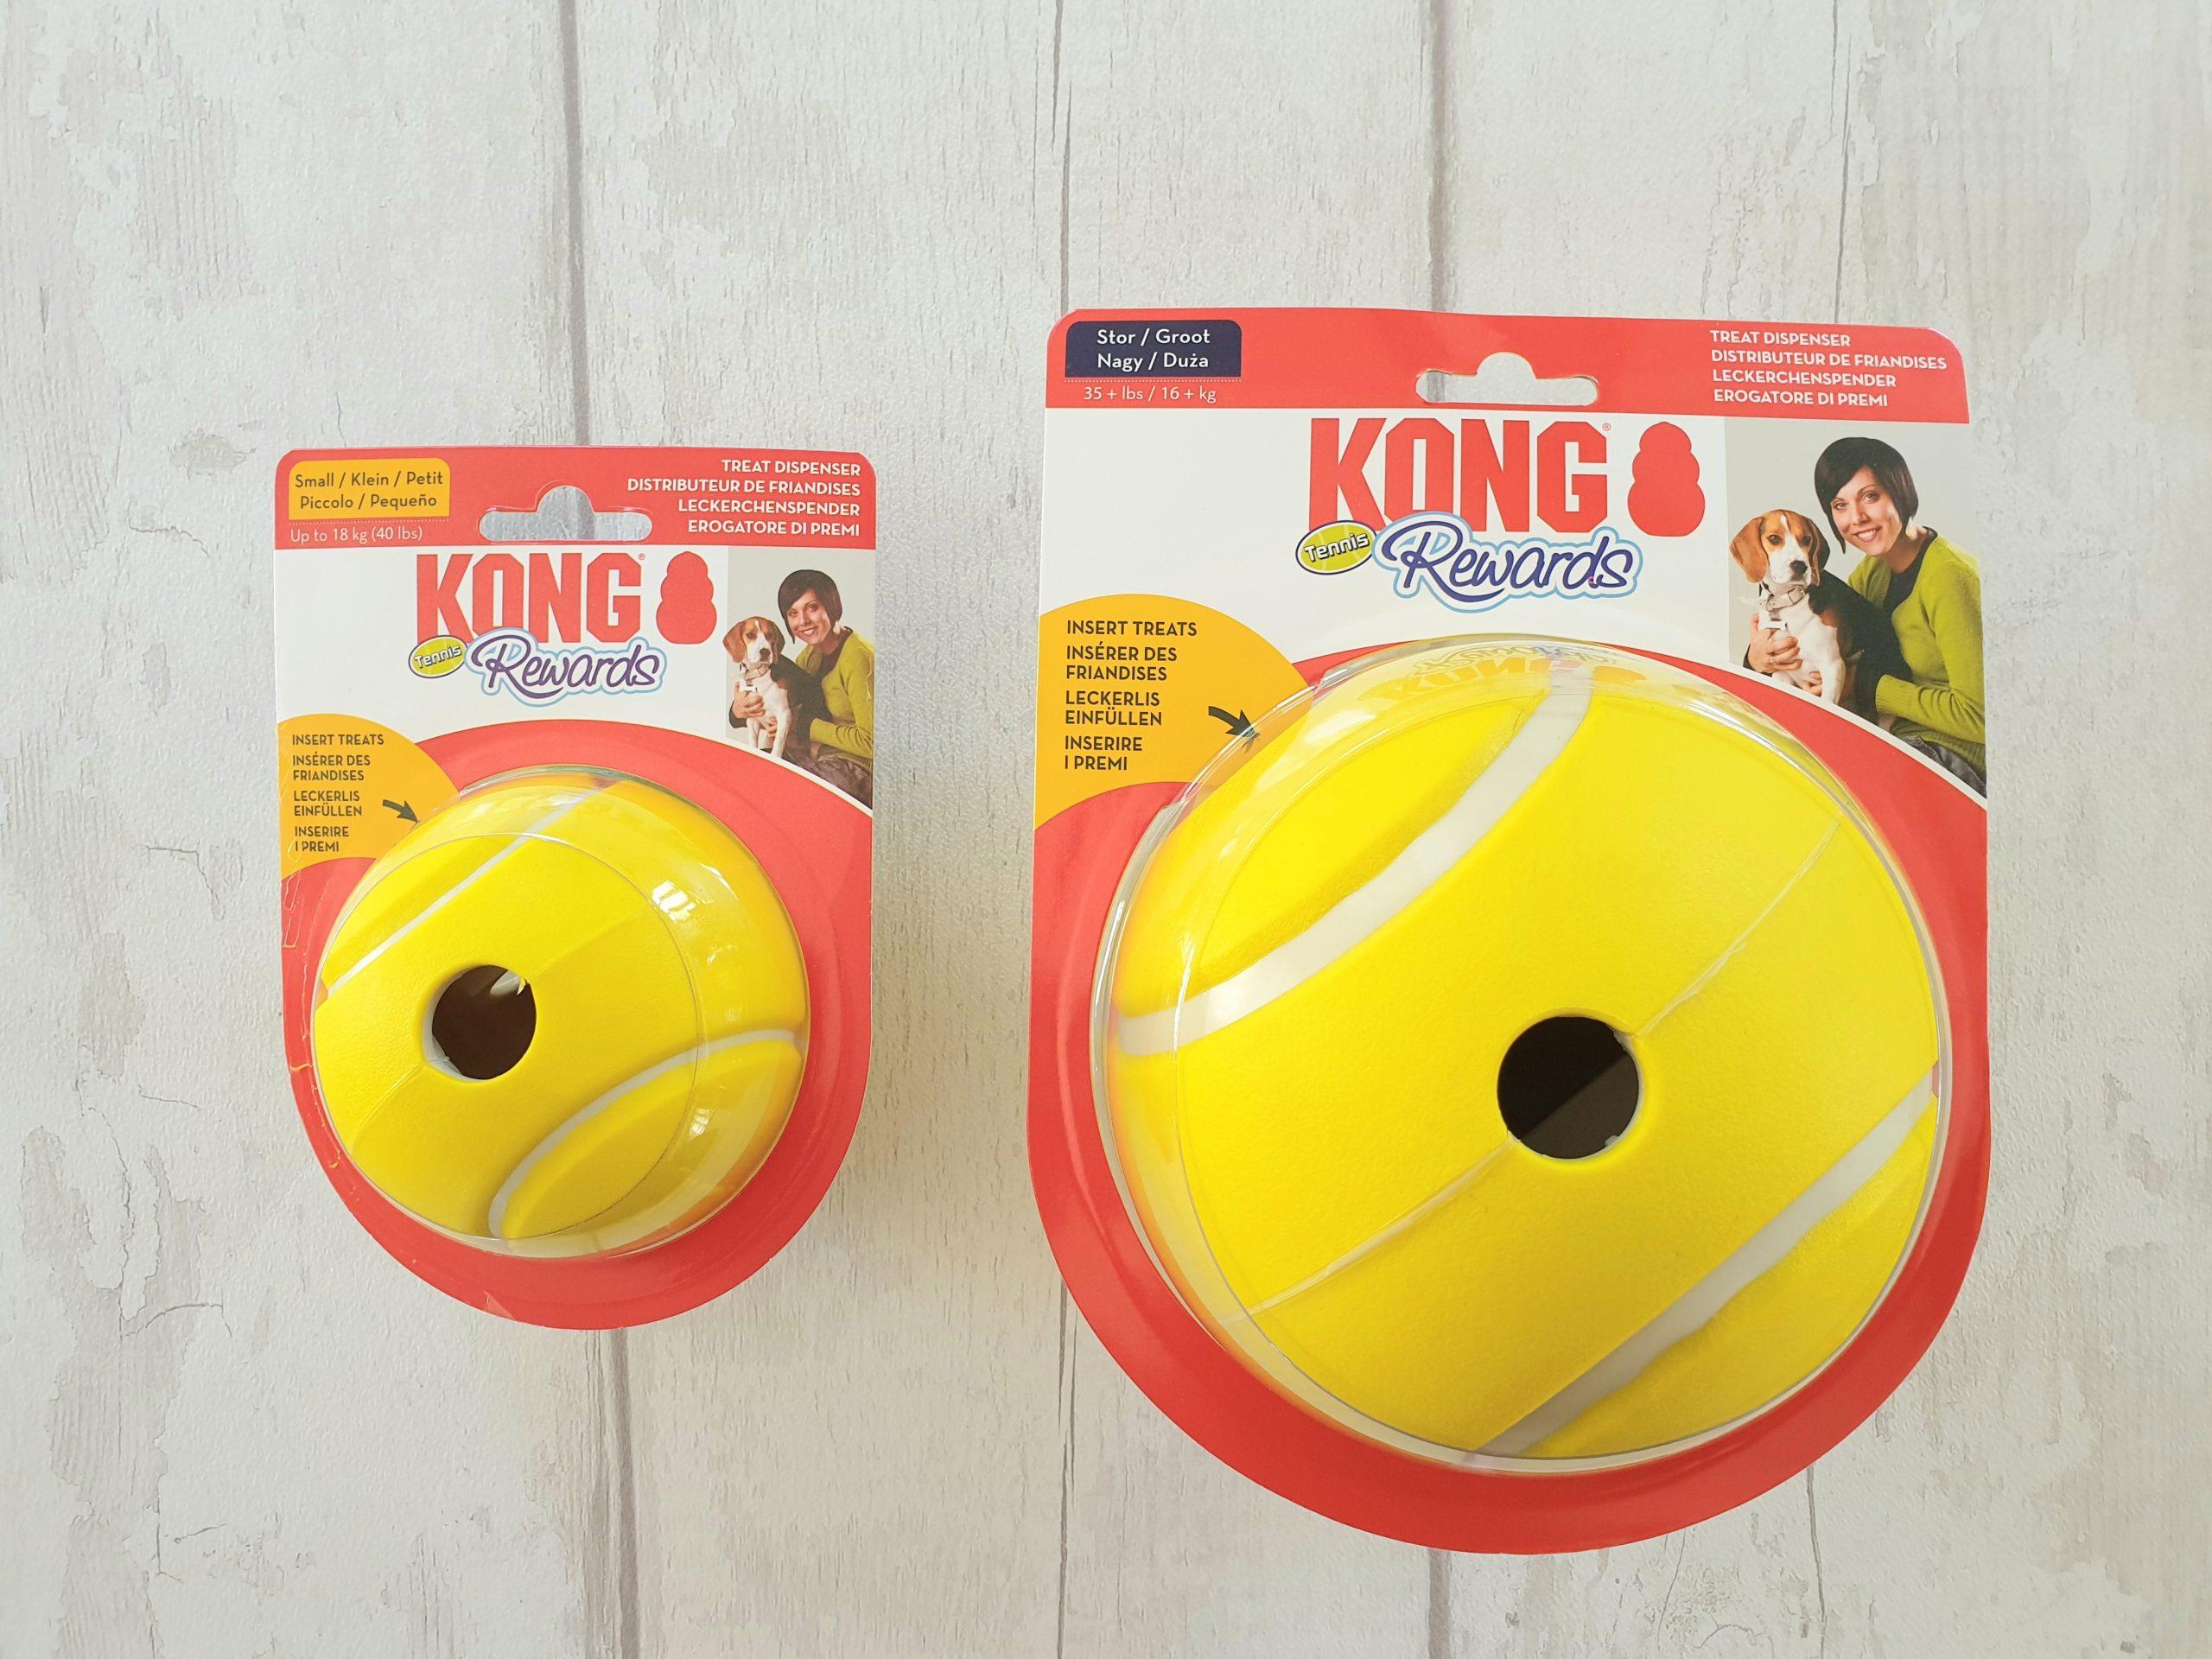 Kong slow feeder enrichment toy